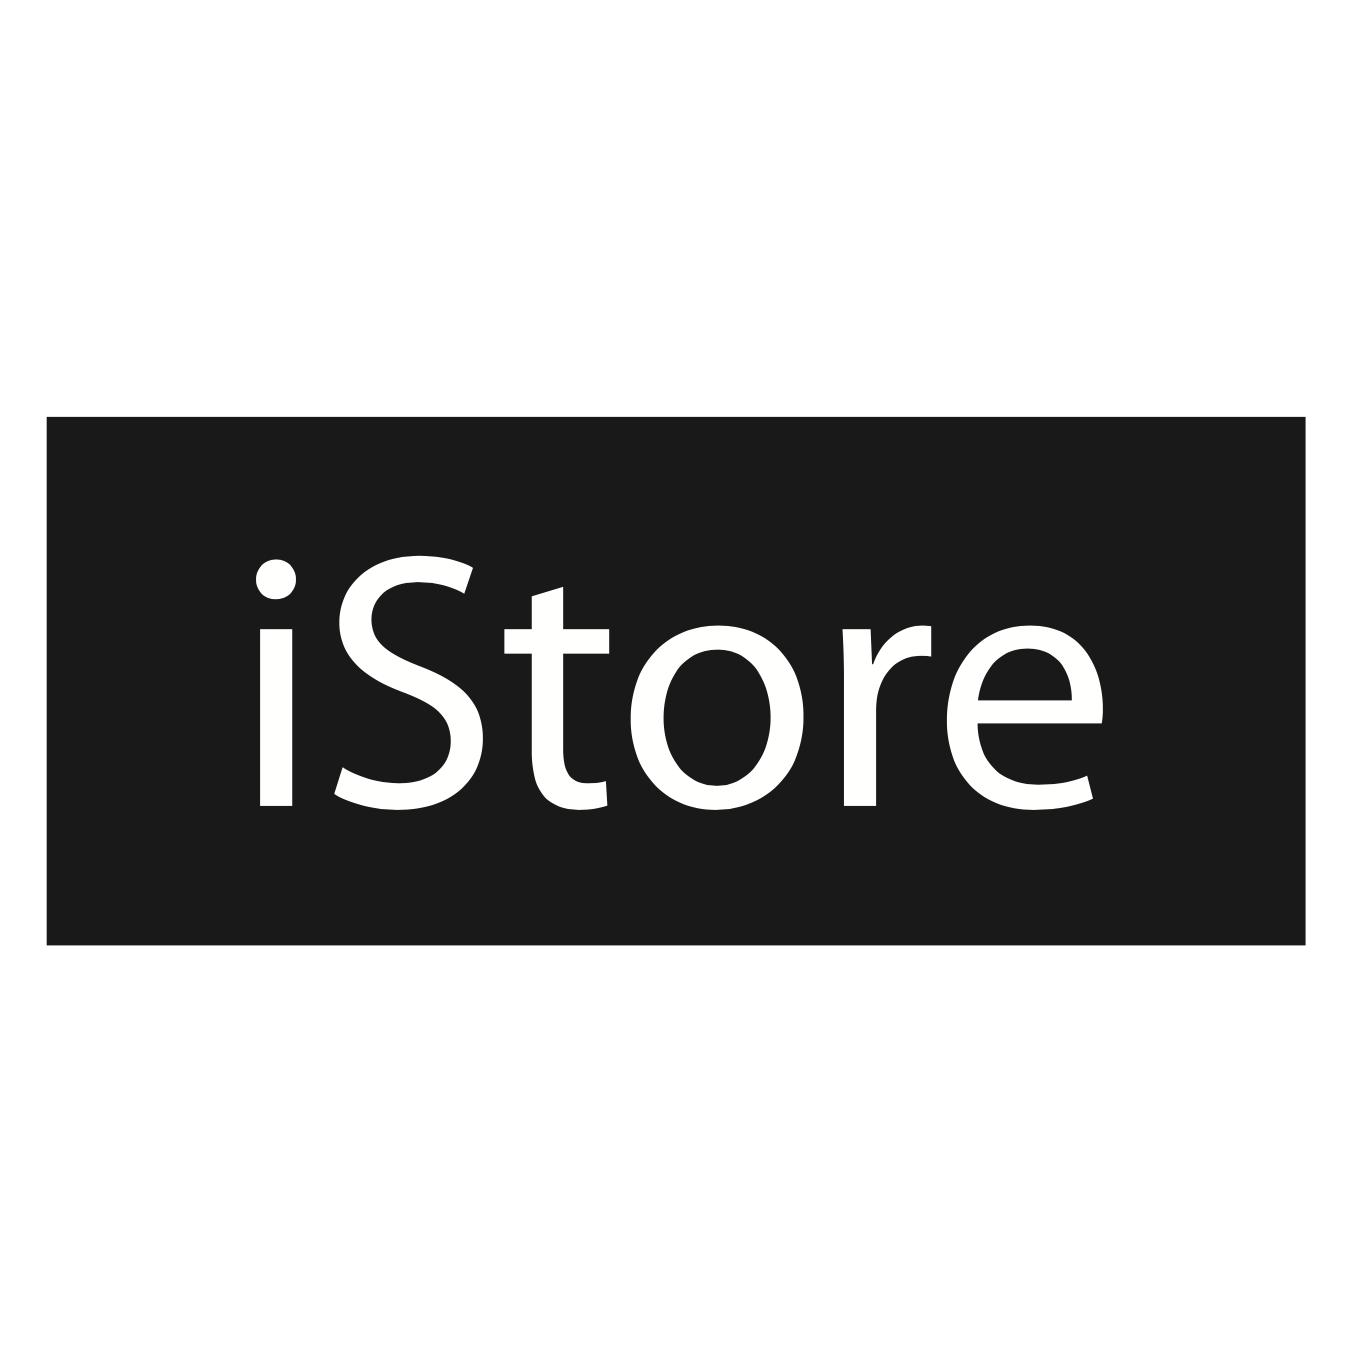 iPhone SE 64GB - Space Grey